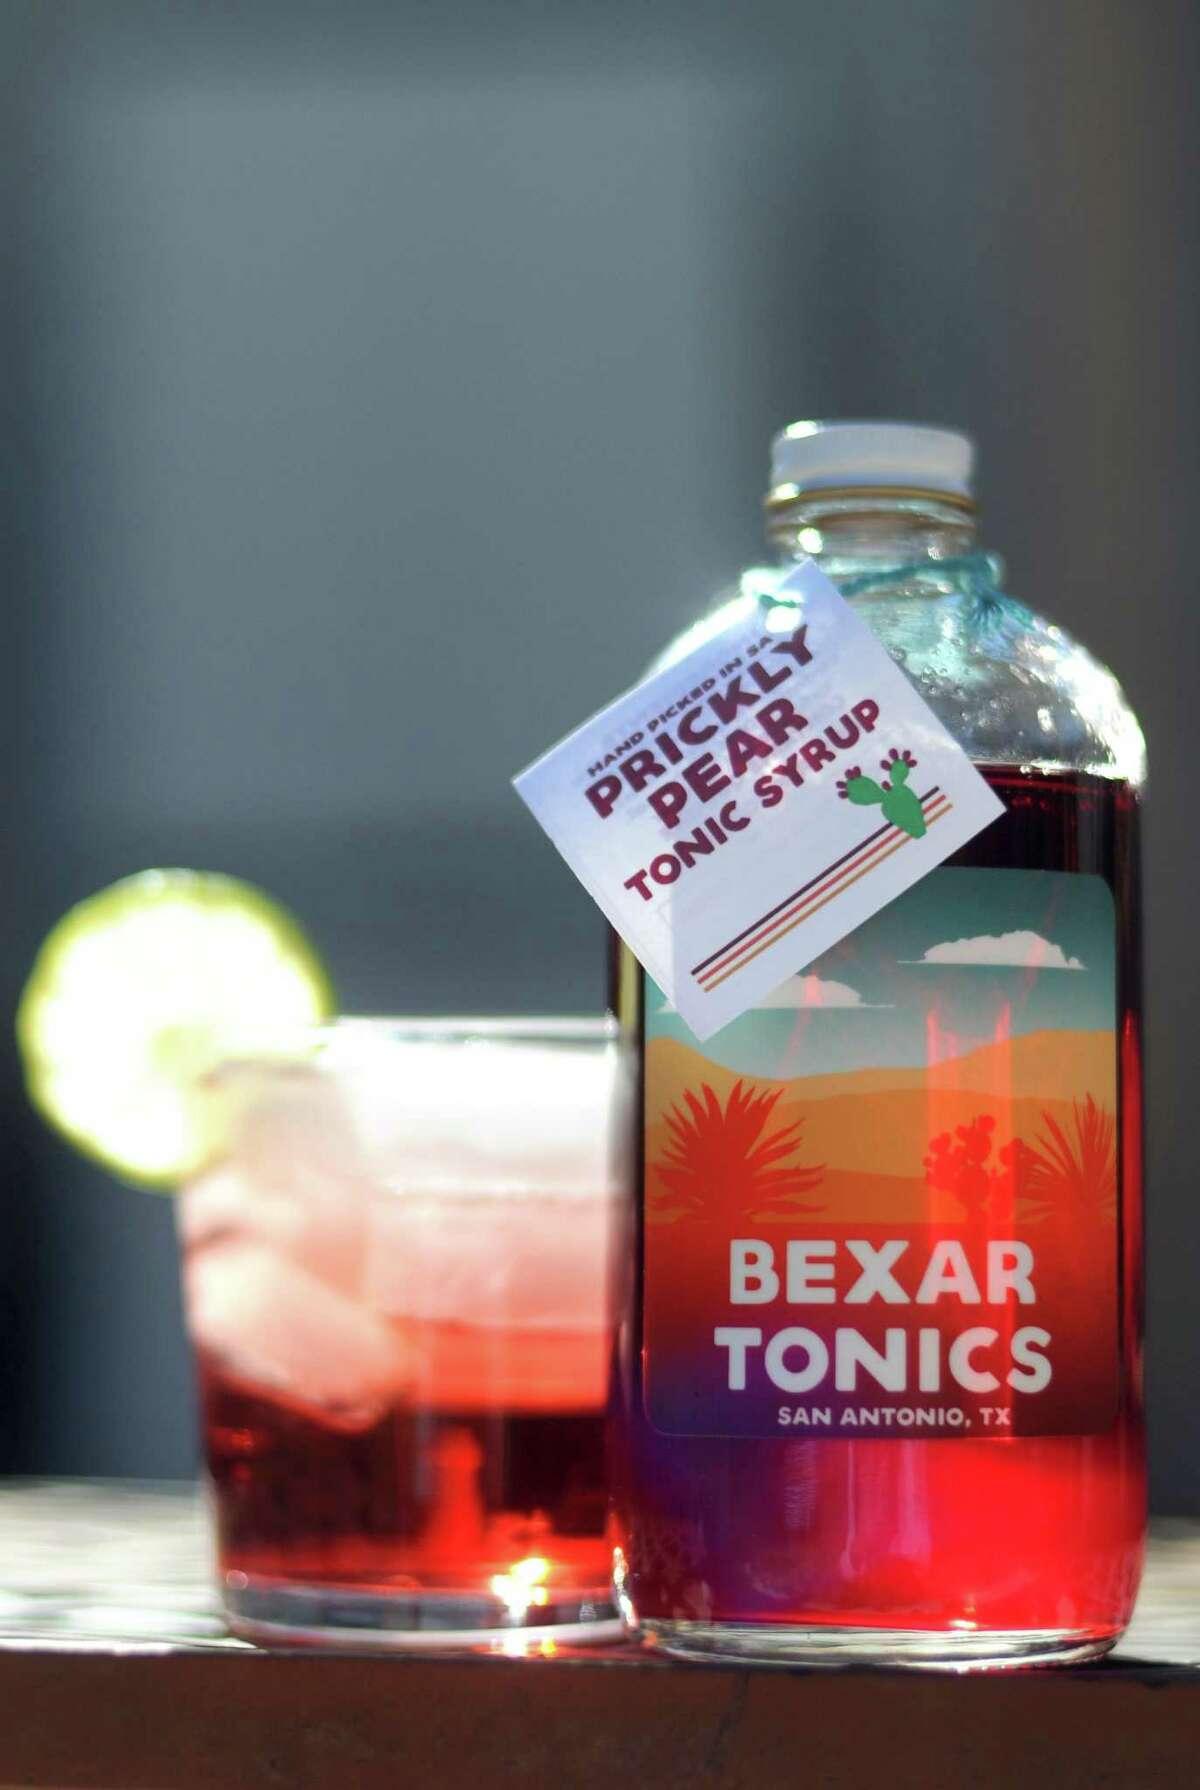 San Antonio-made Bexar Tonics' line of tonic syrups can give your next cocktail a distinctive San Antonio flair.